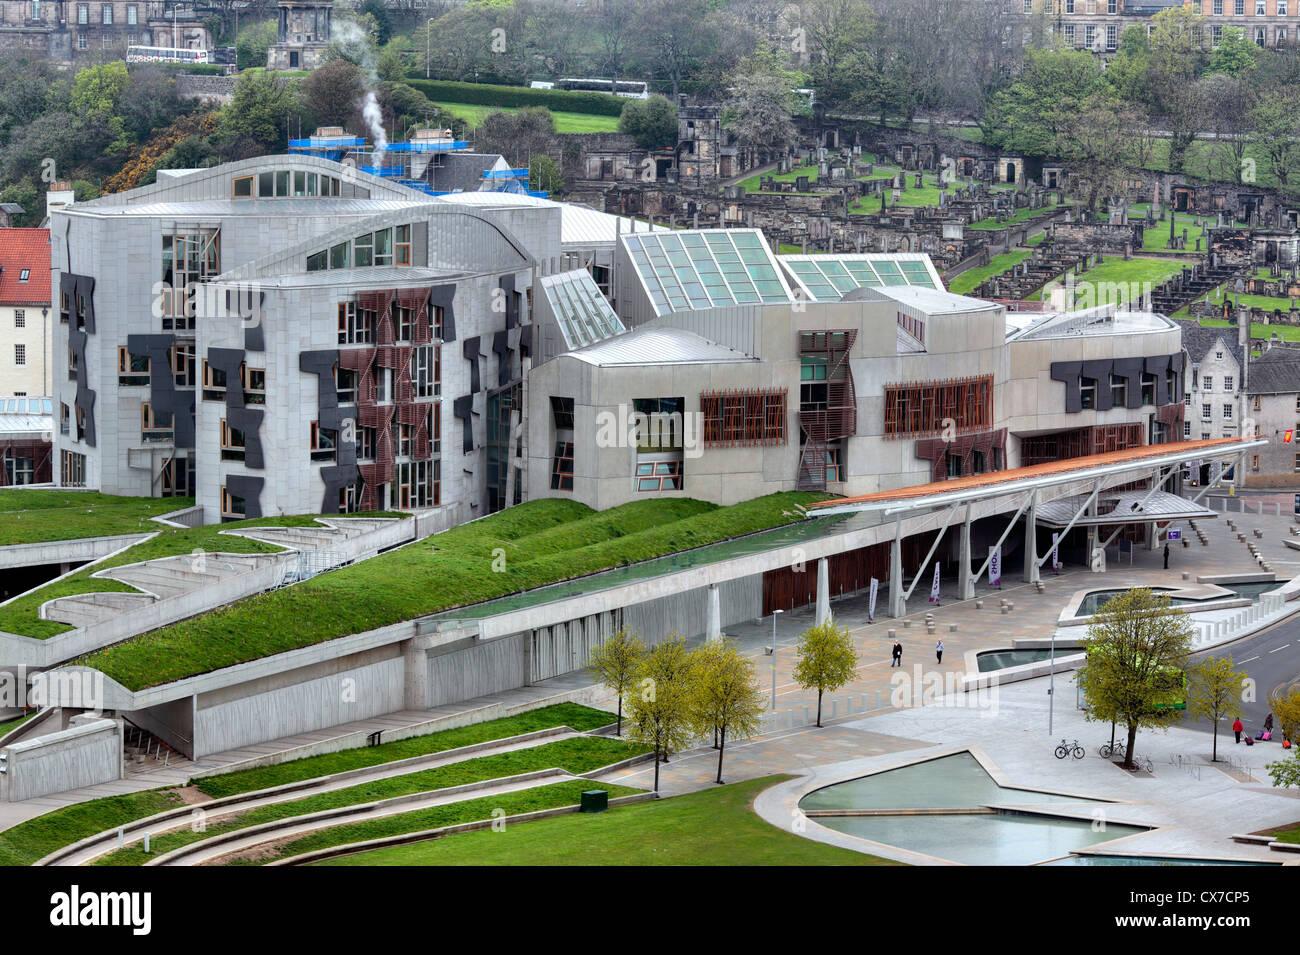 Scottish Parliament Building, Holyrood, Edinburgh, Scotland, UK - Stock Image